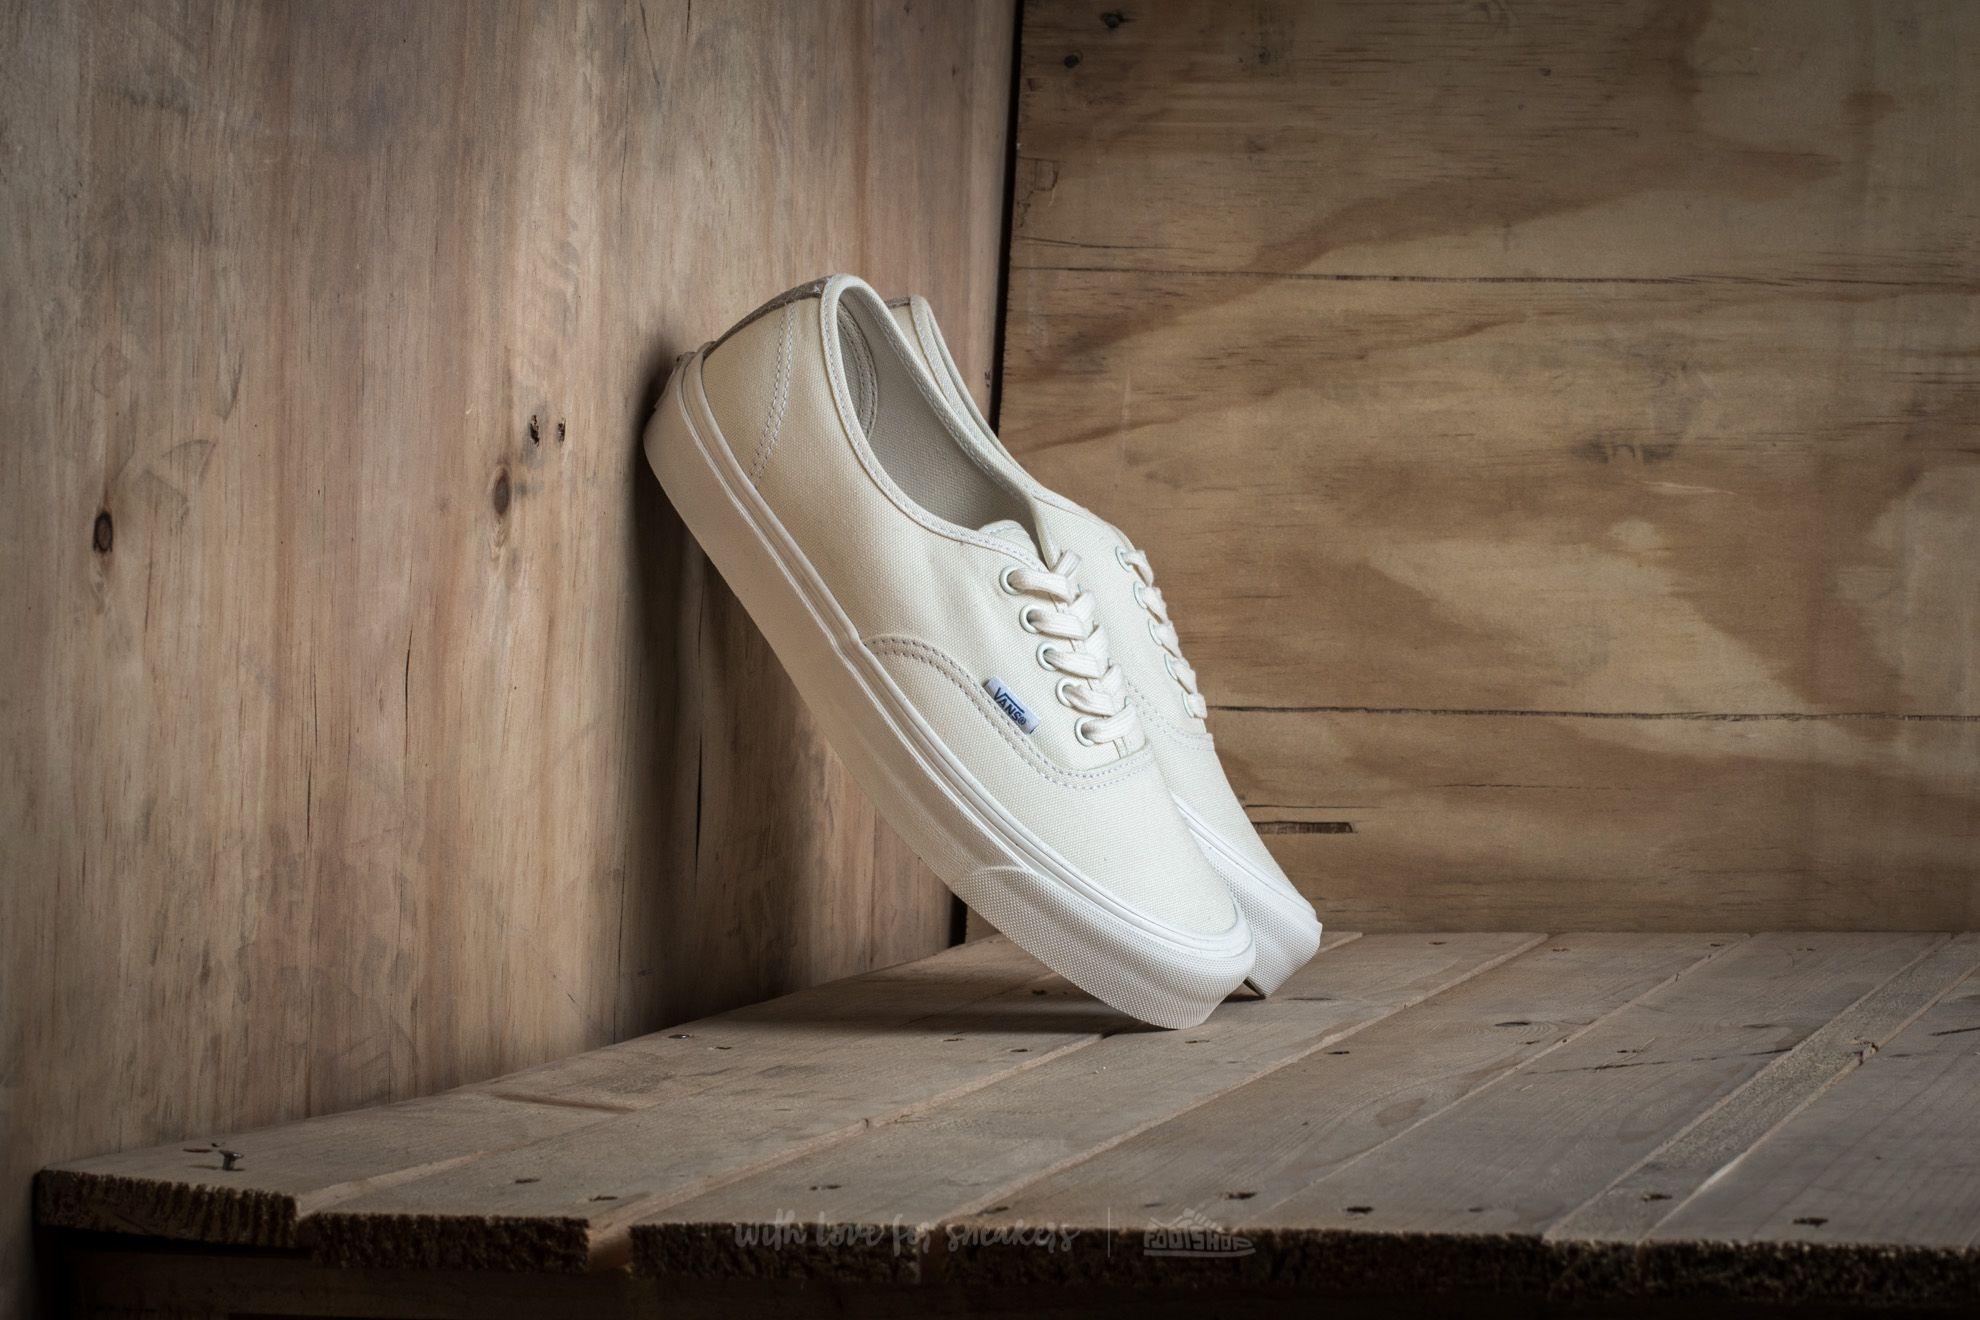 Vans OG Authentic LX (Canvas/ Suede) Classic White/ Safari